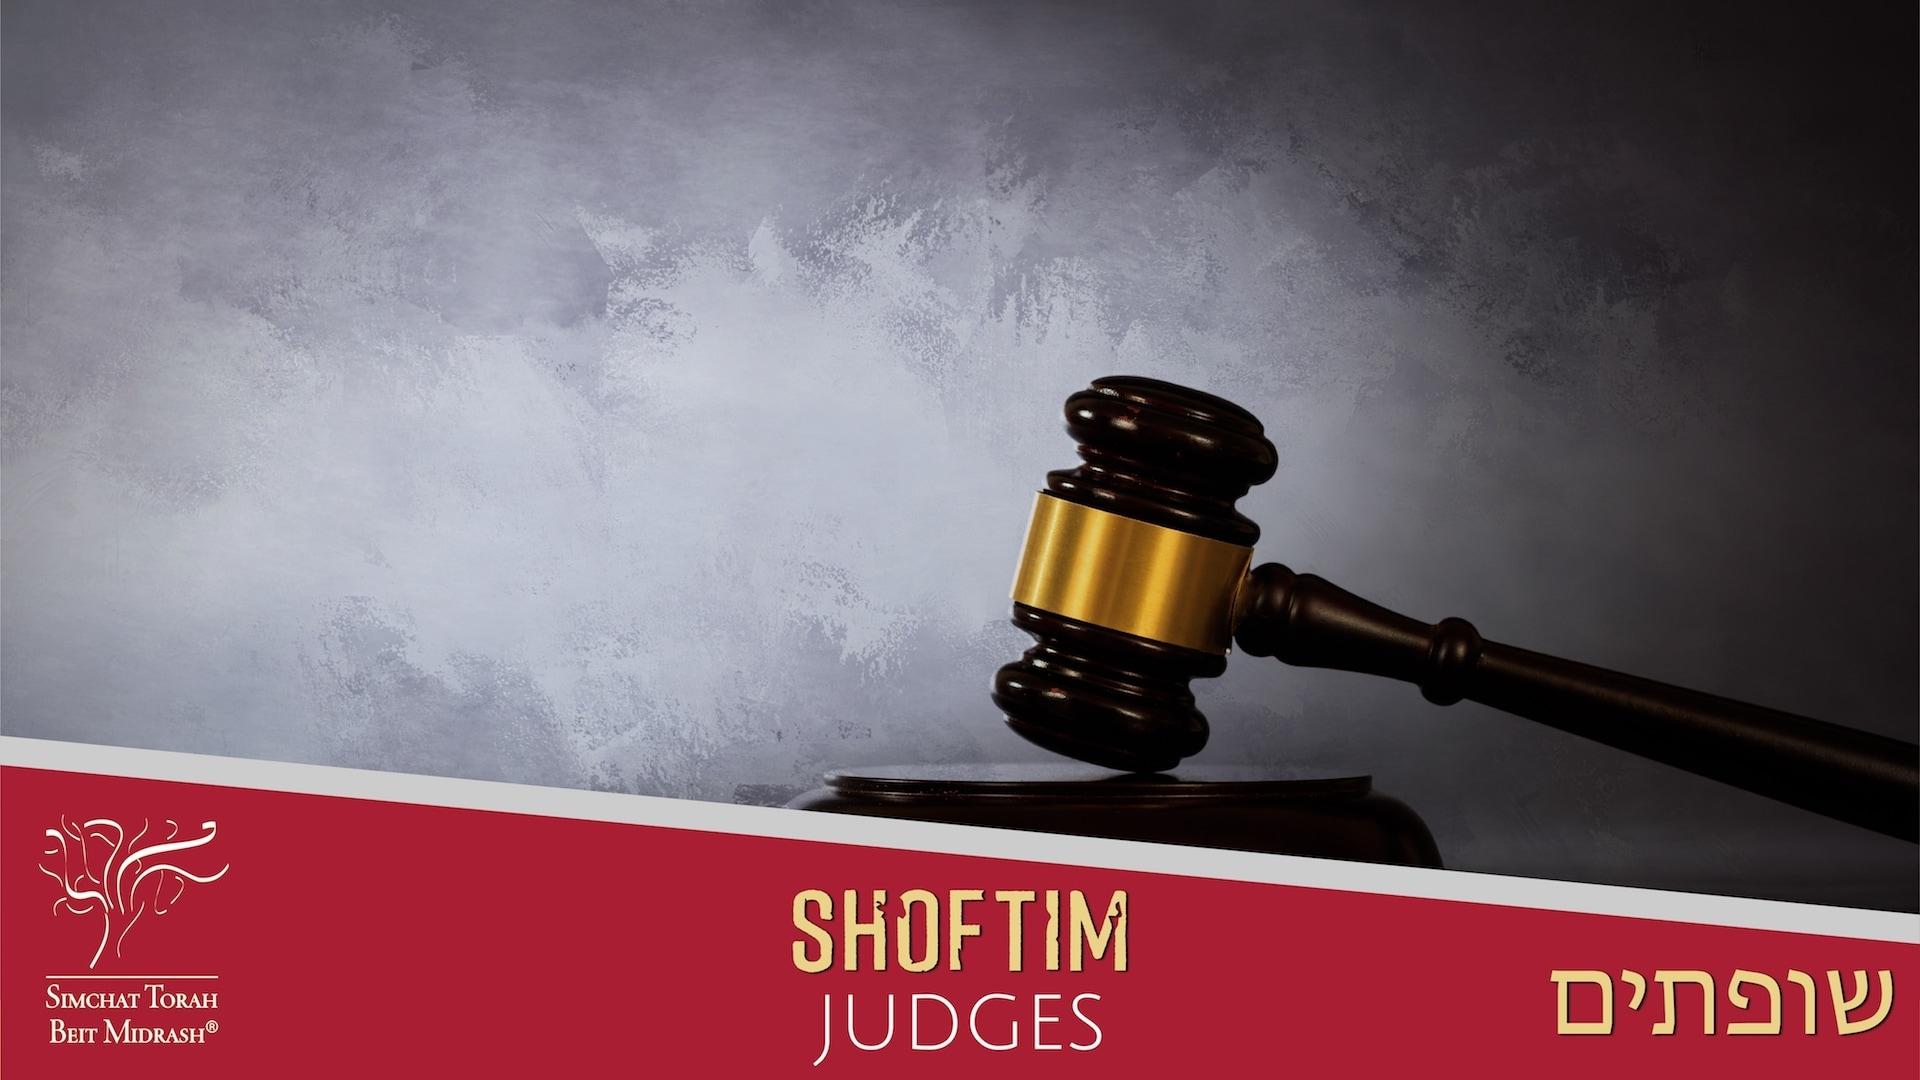 Shoftim - Simchat Torah Beit Midrash in This Week's Torah Portion 2019